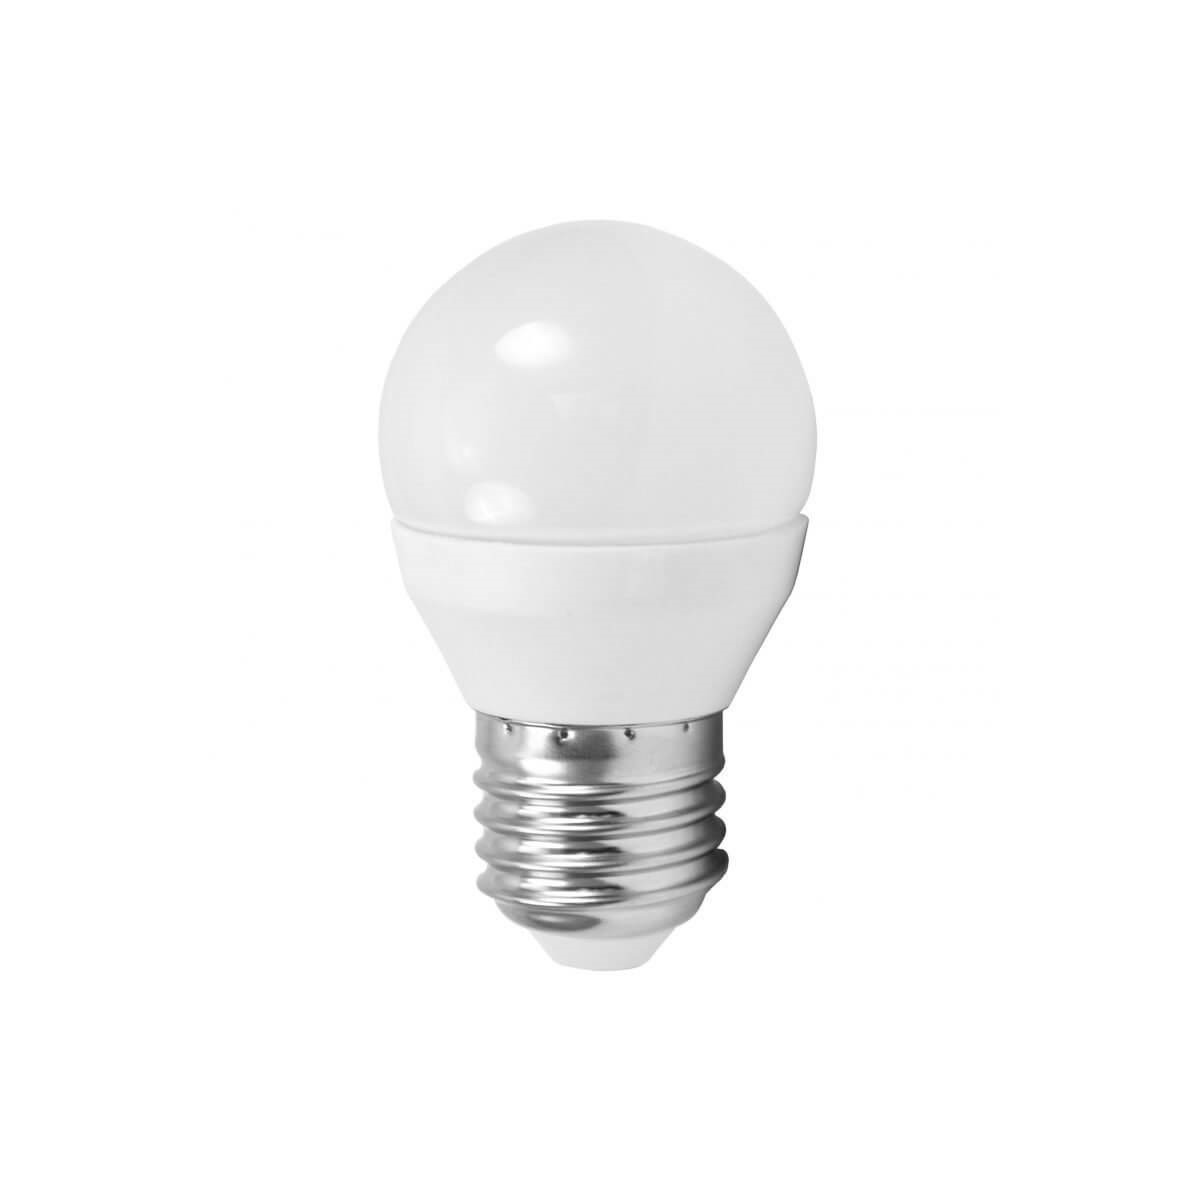 Image of Pære LED 250lm/25W Krone E27 - Attralux